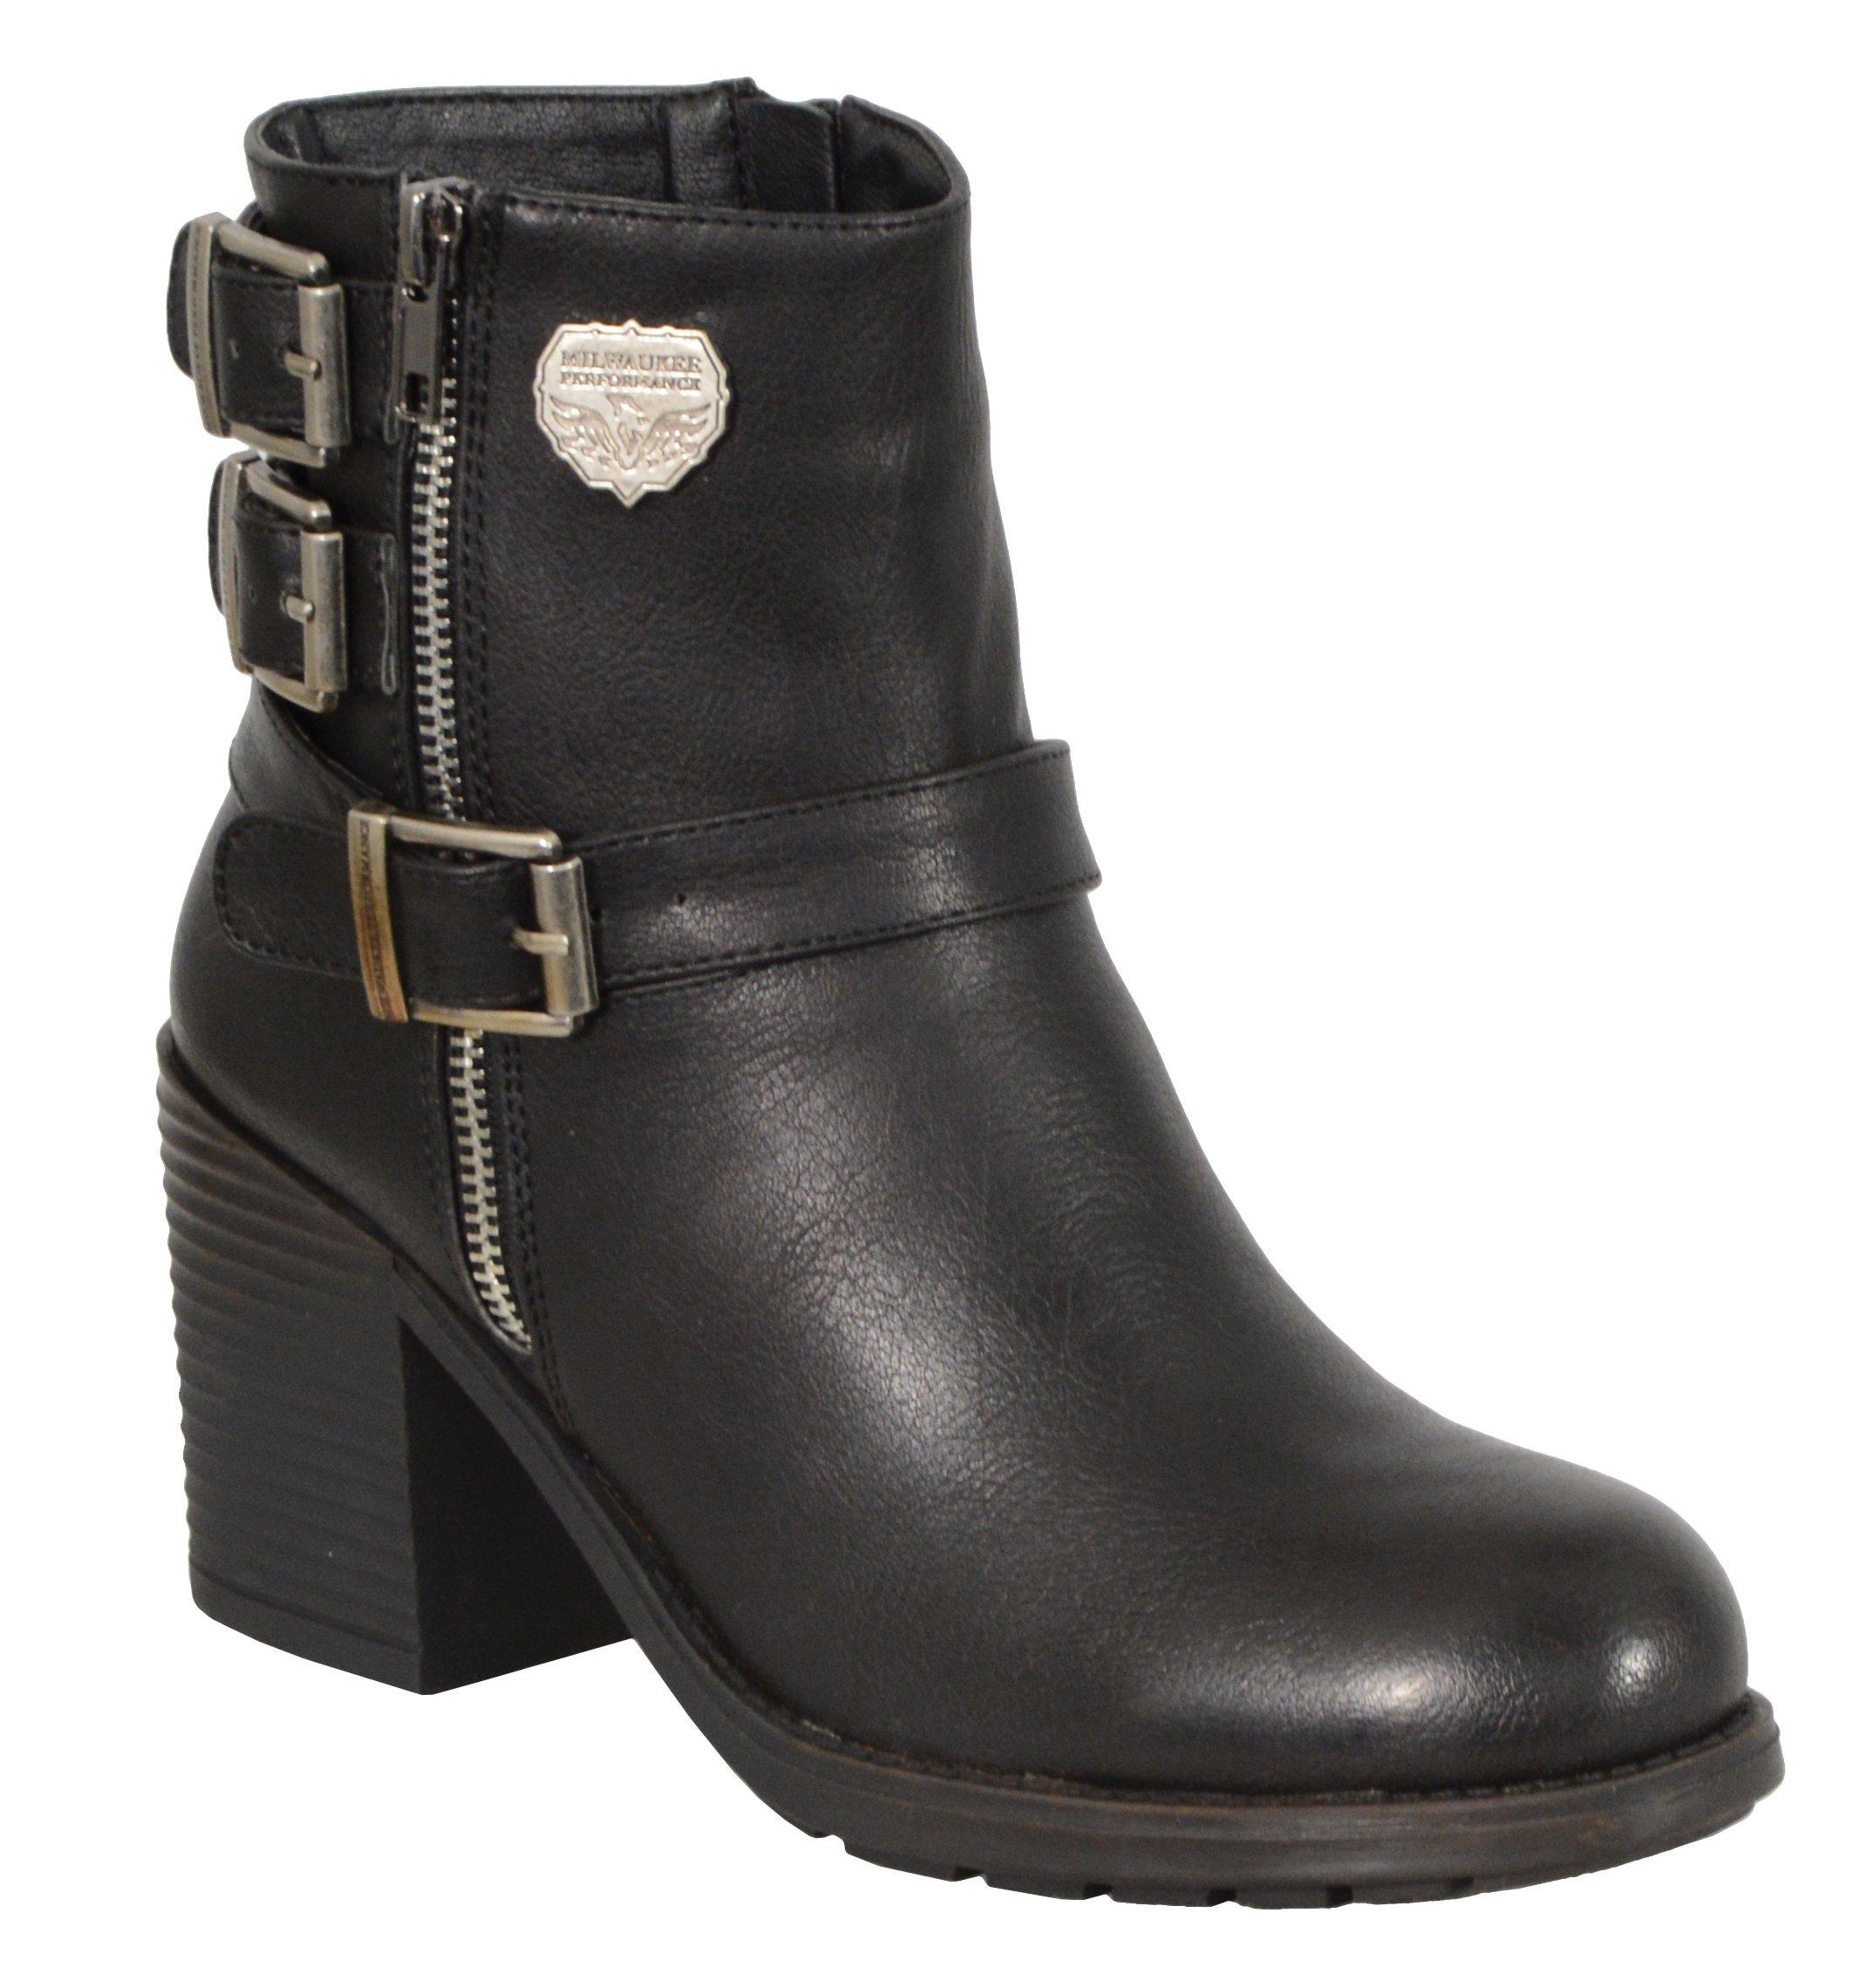 Milwaukee Performance Women's Triple Buckle Side Zip Boots with Platform Heel (Black, Size 7)